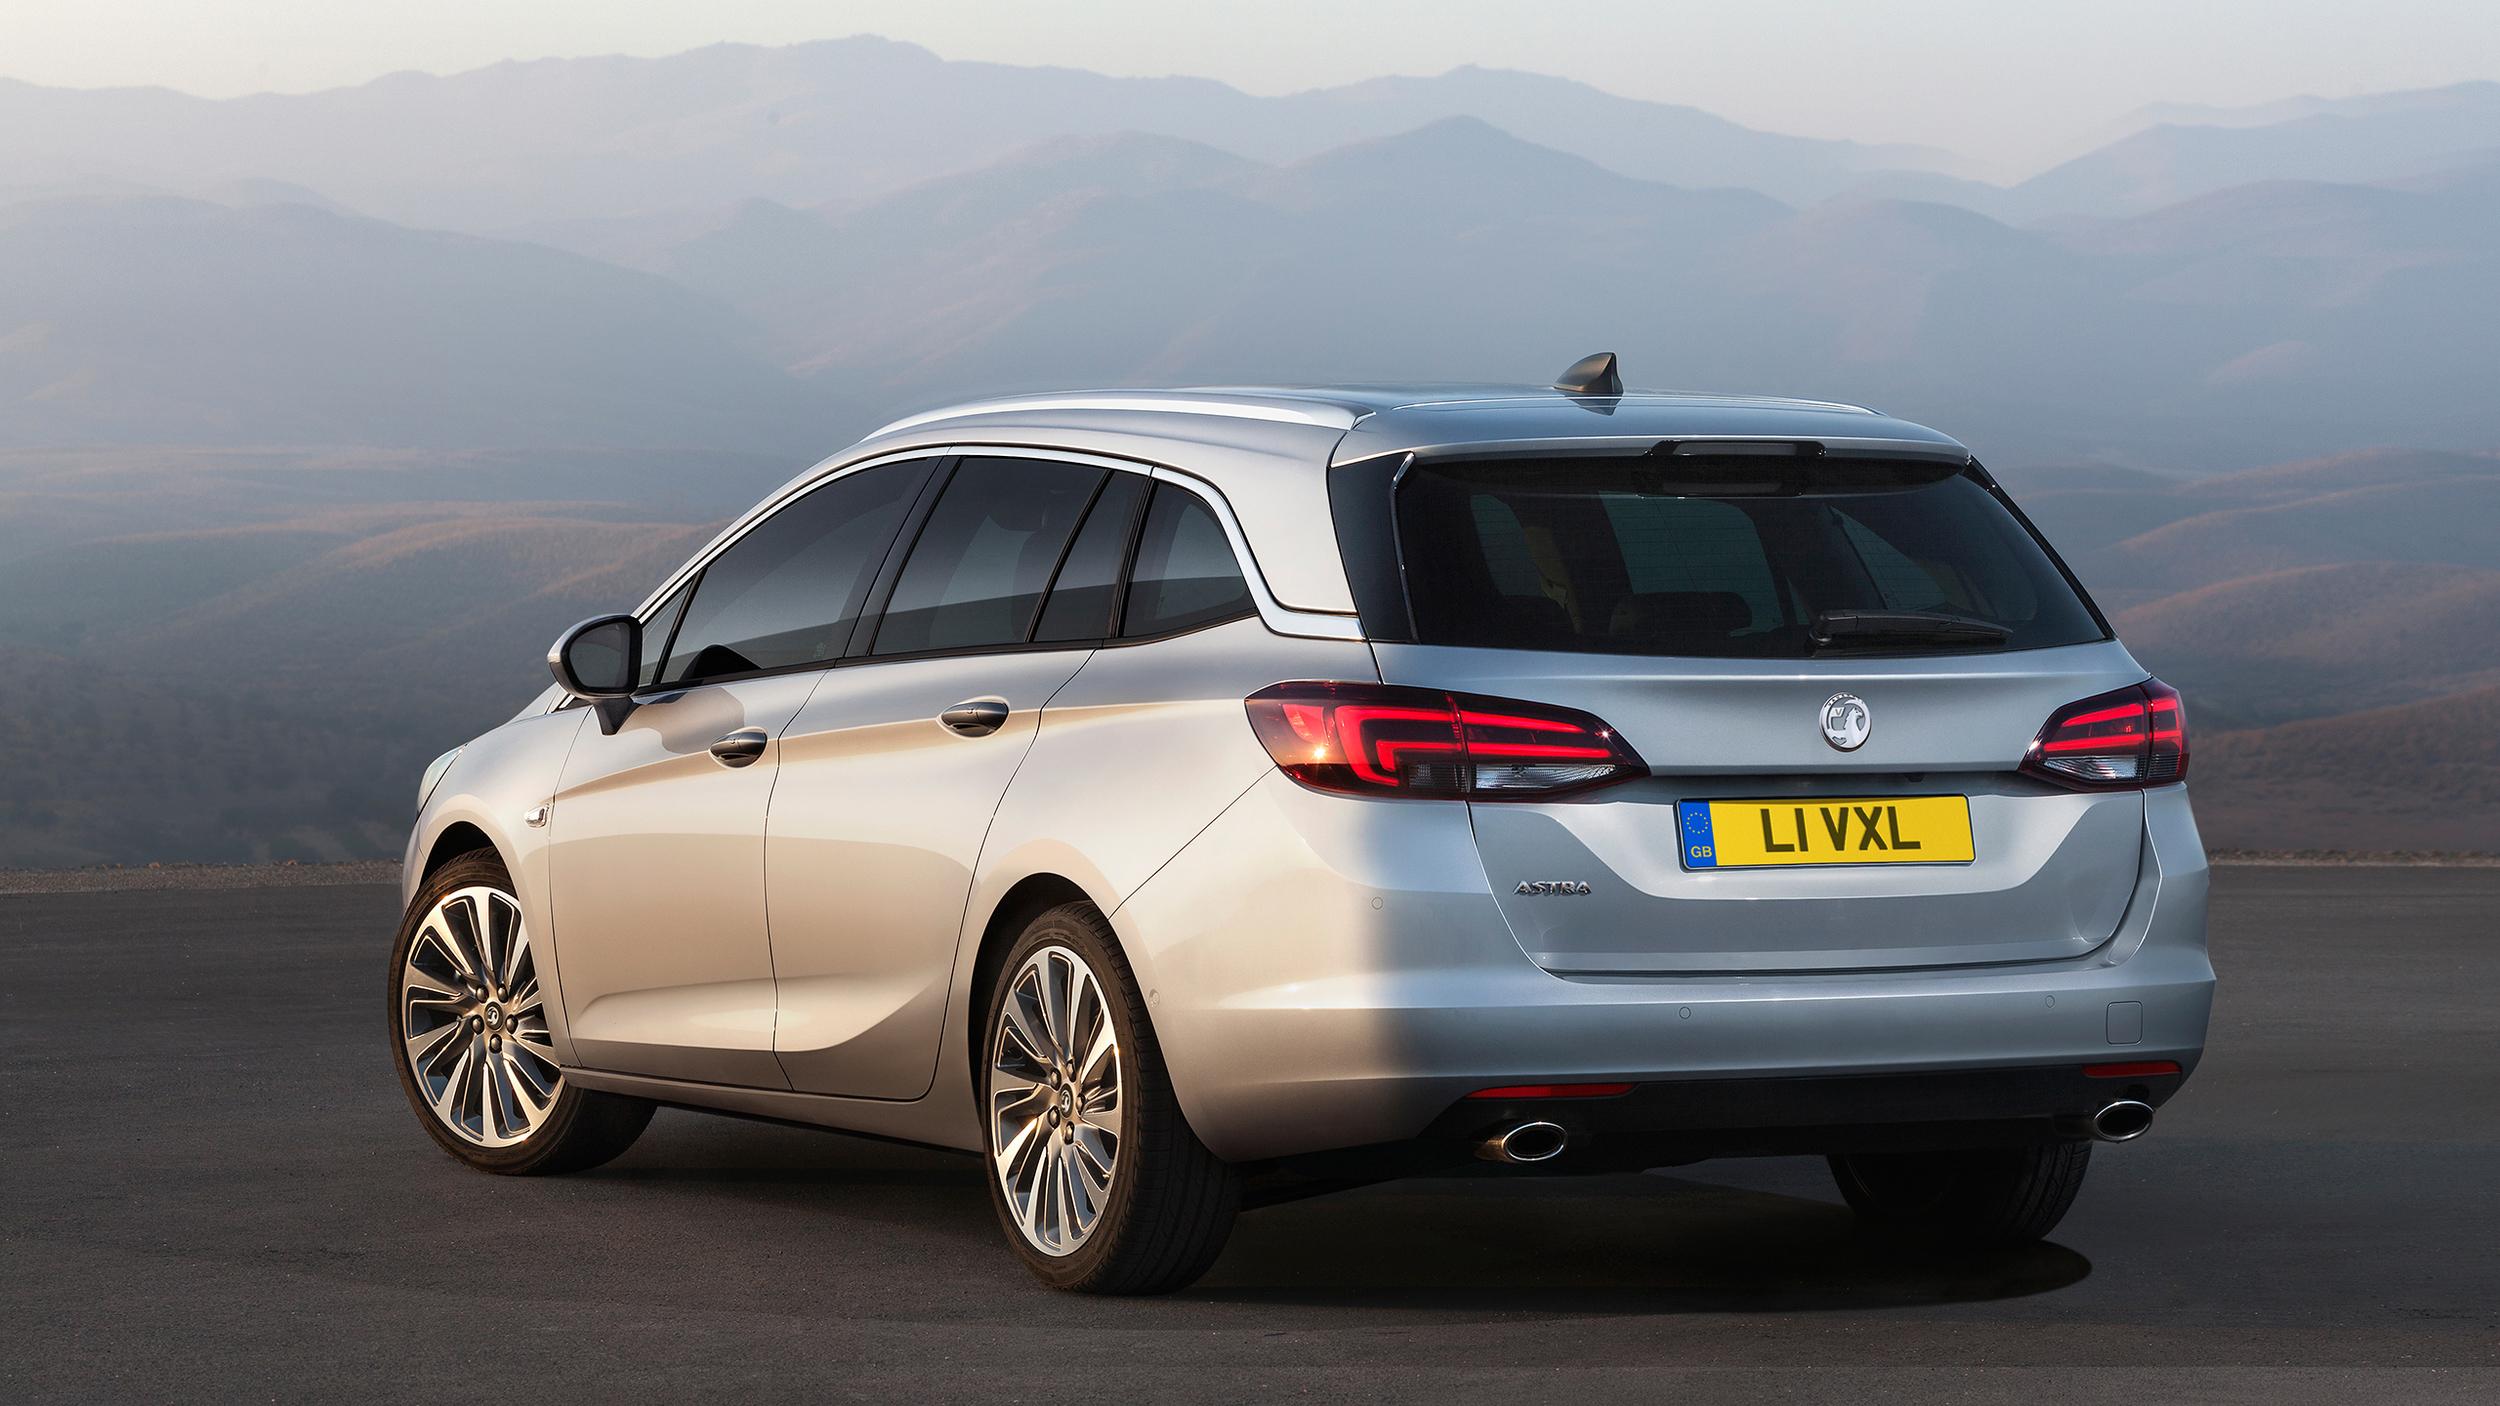 Vauxhall reveals all-new Astra Sports Tourer